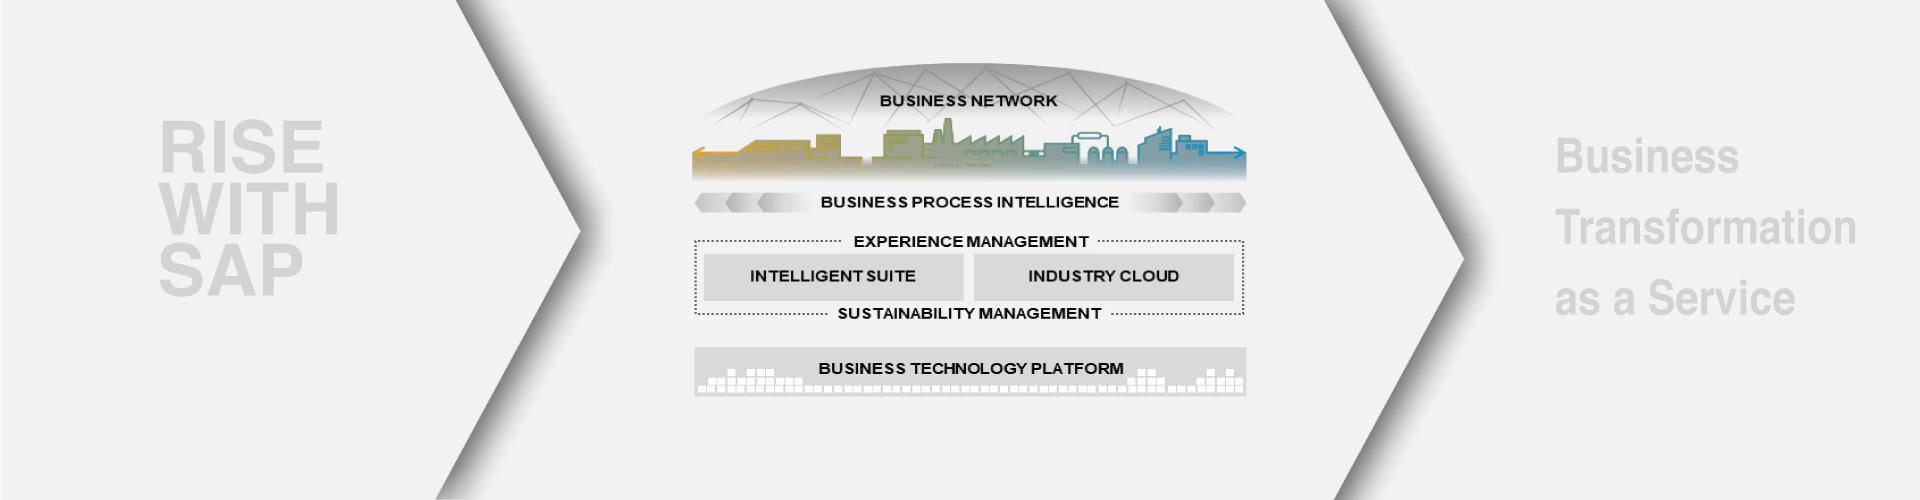 RISE with SAP | SAP S/4HANA Cloud offering